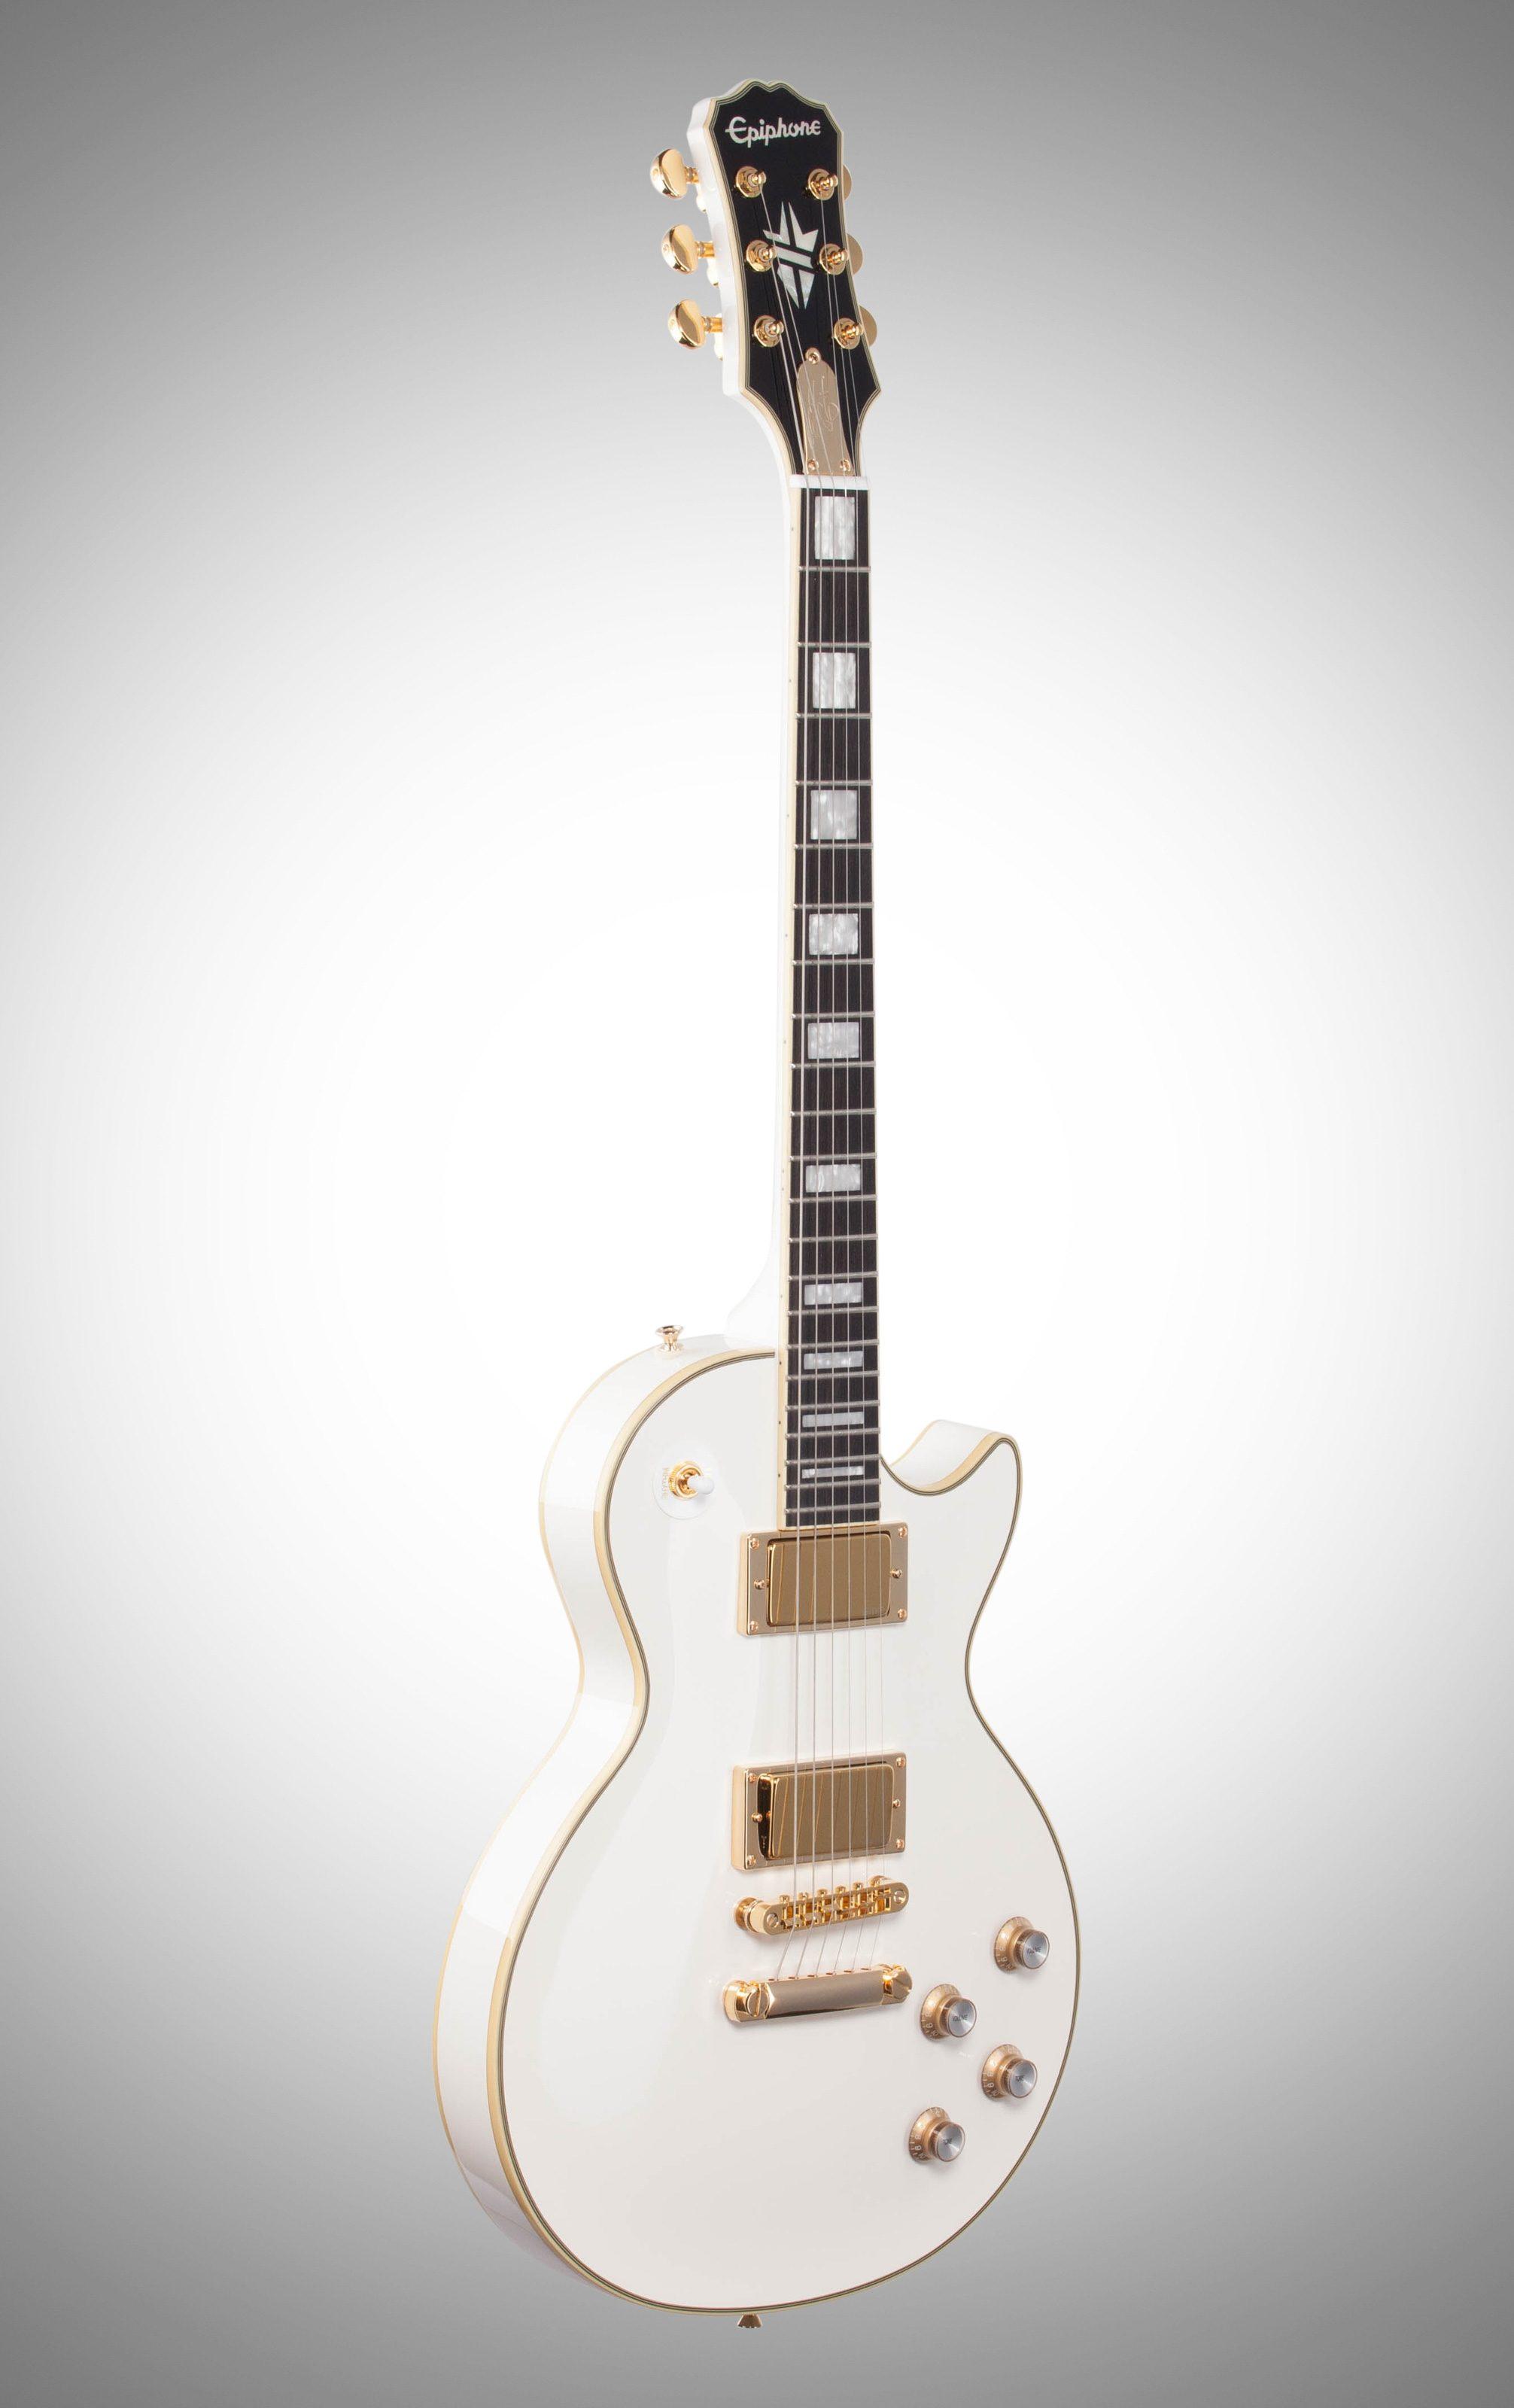 Epiphone Bjorn Gelotte Les Paul Custom Electric Guitar With Case